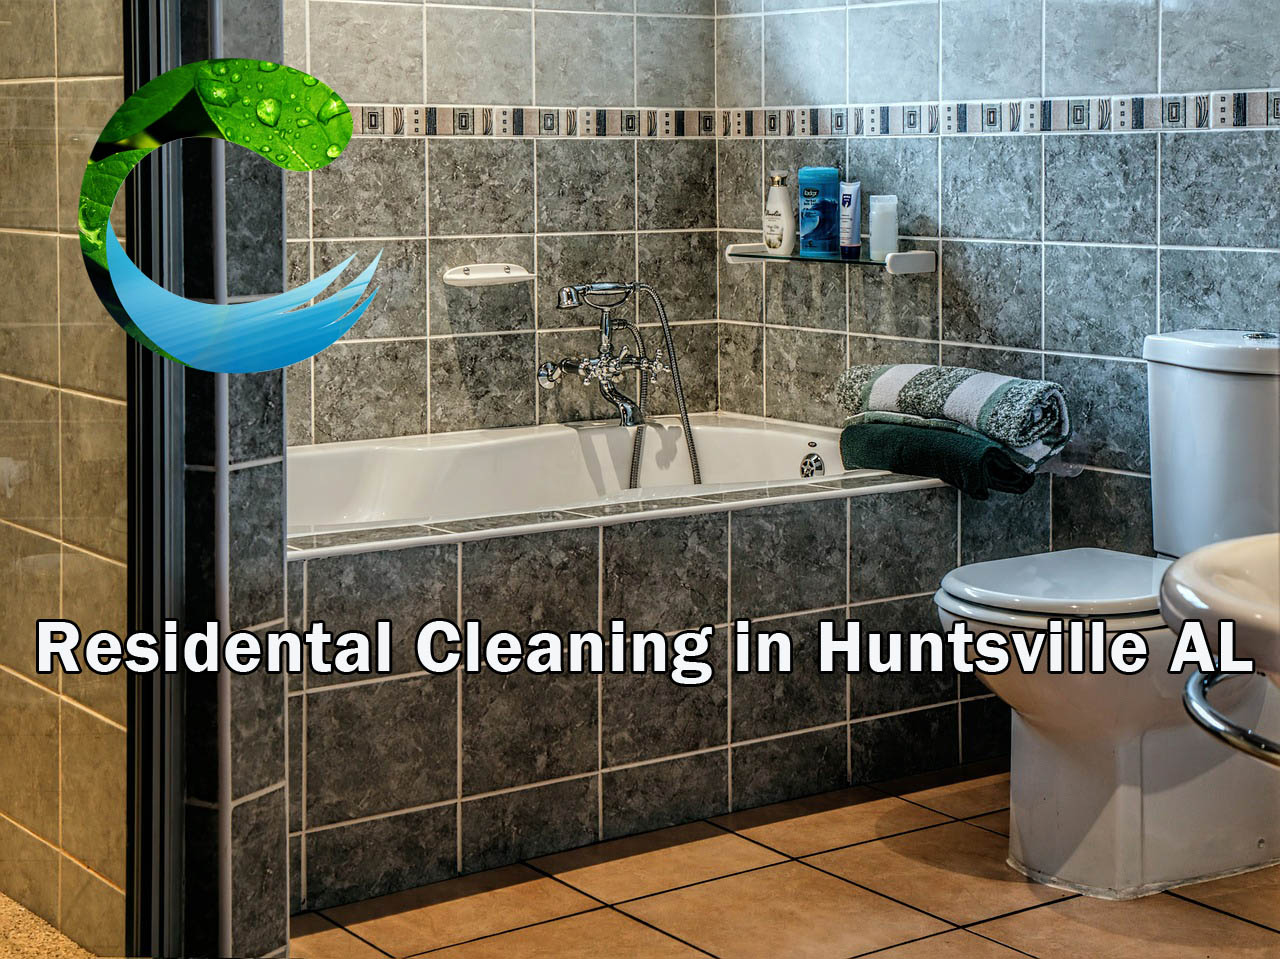 Residential Cleaning in Huntsville AL